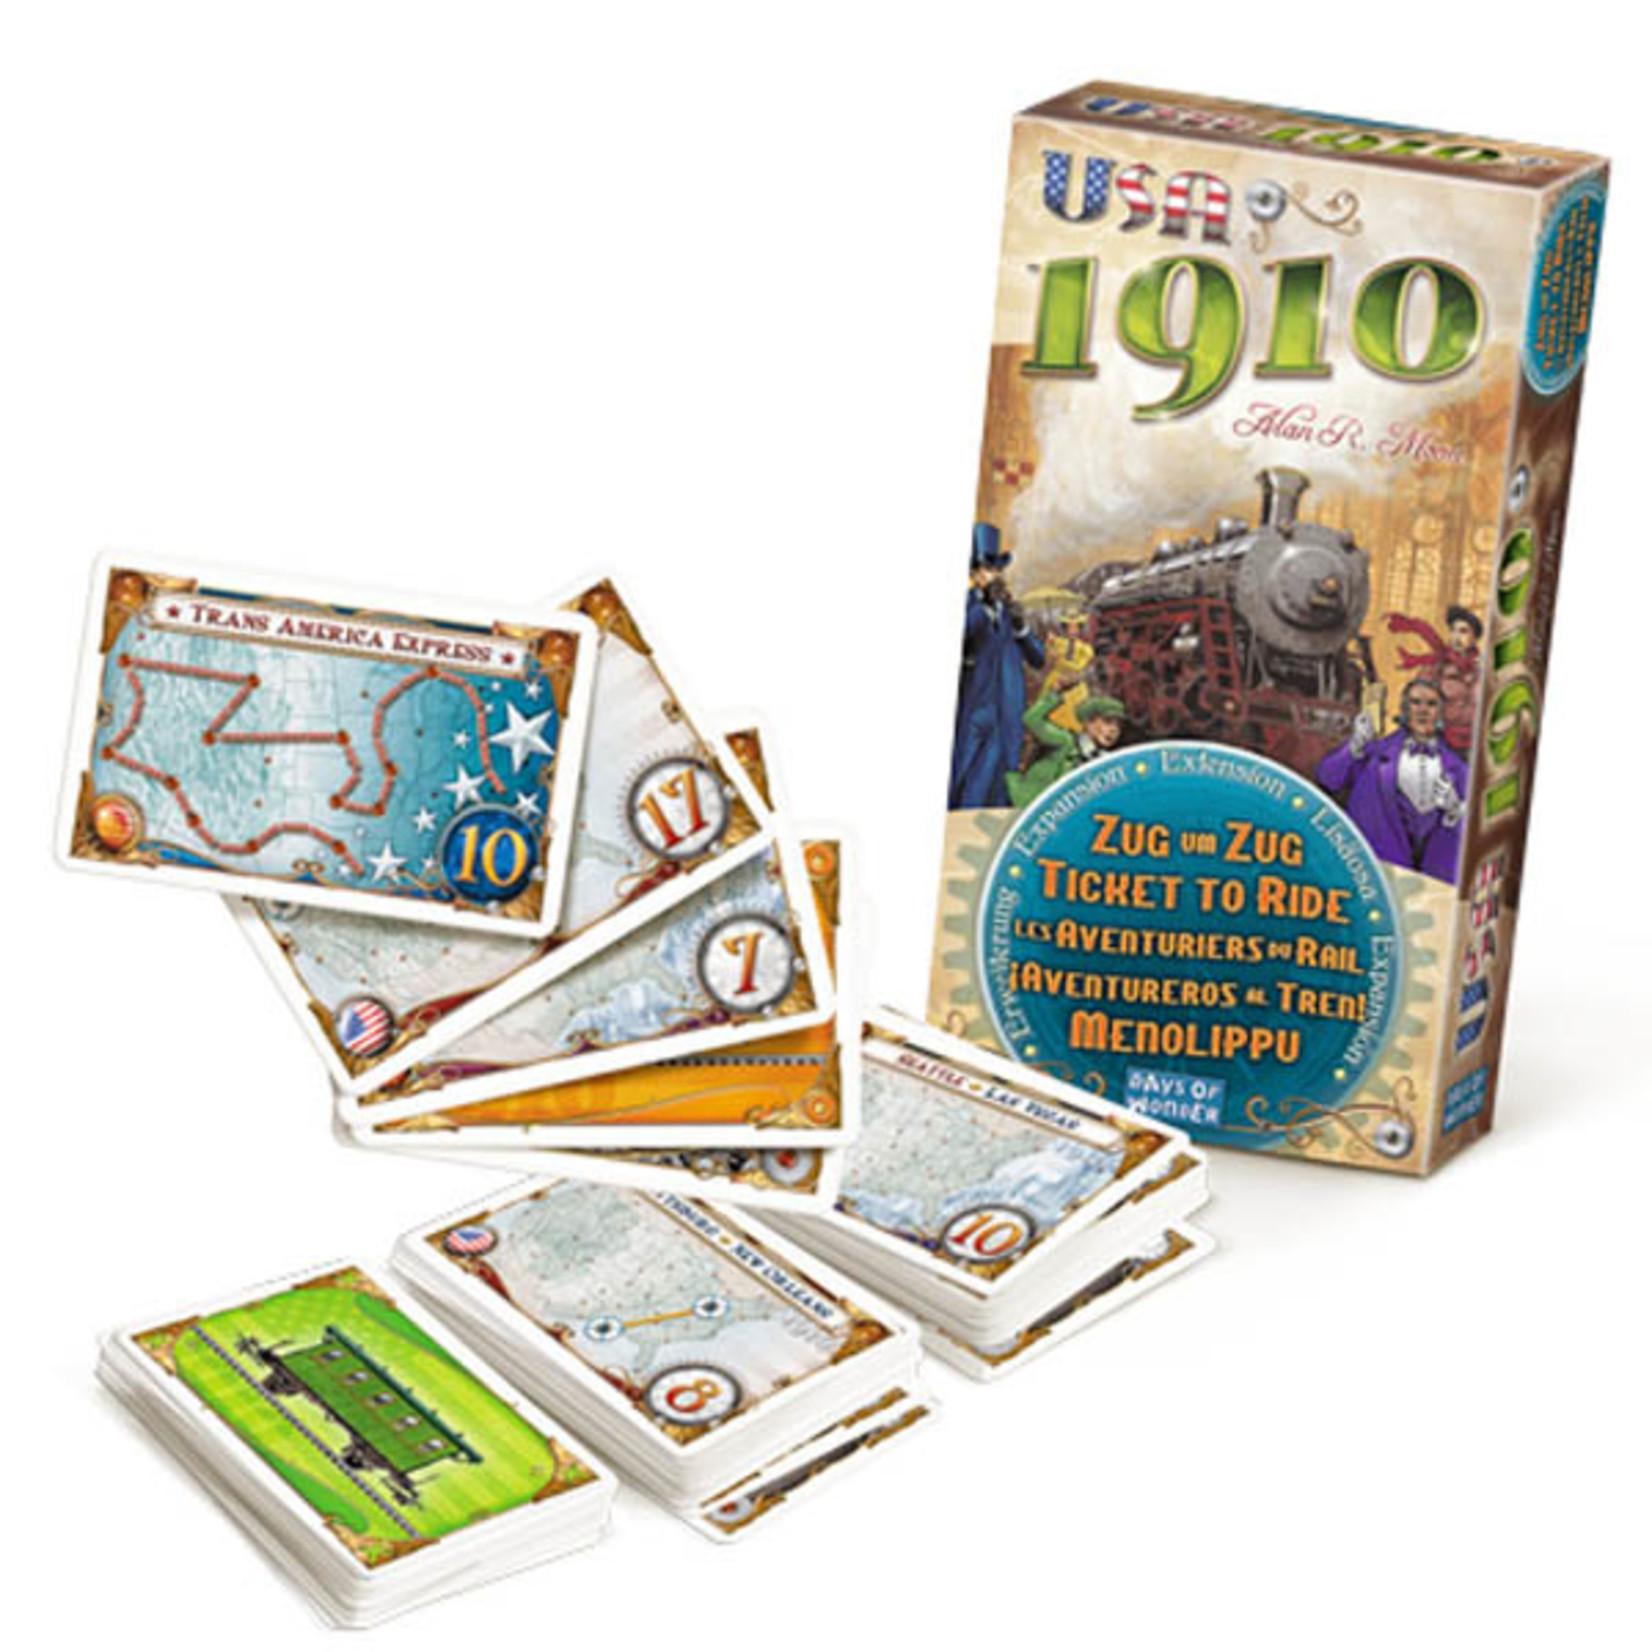 Days of Wonder Ticket to Ride: USA 1910 Expansion